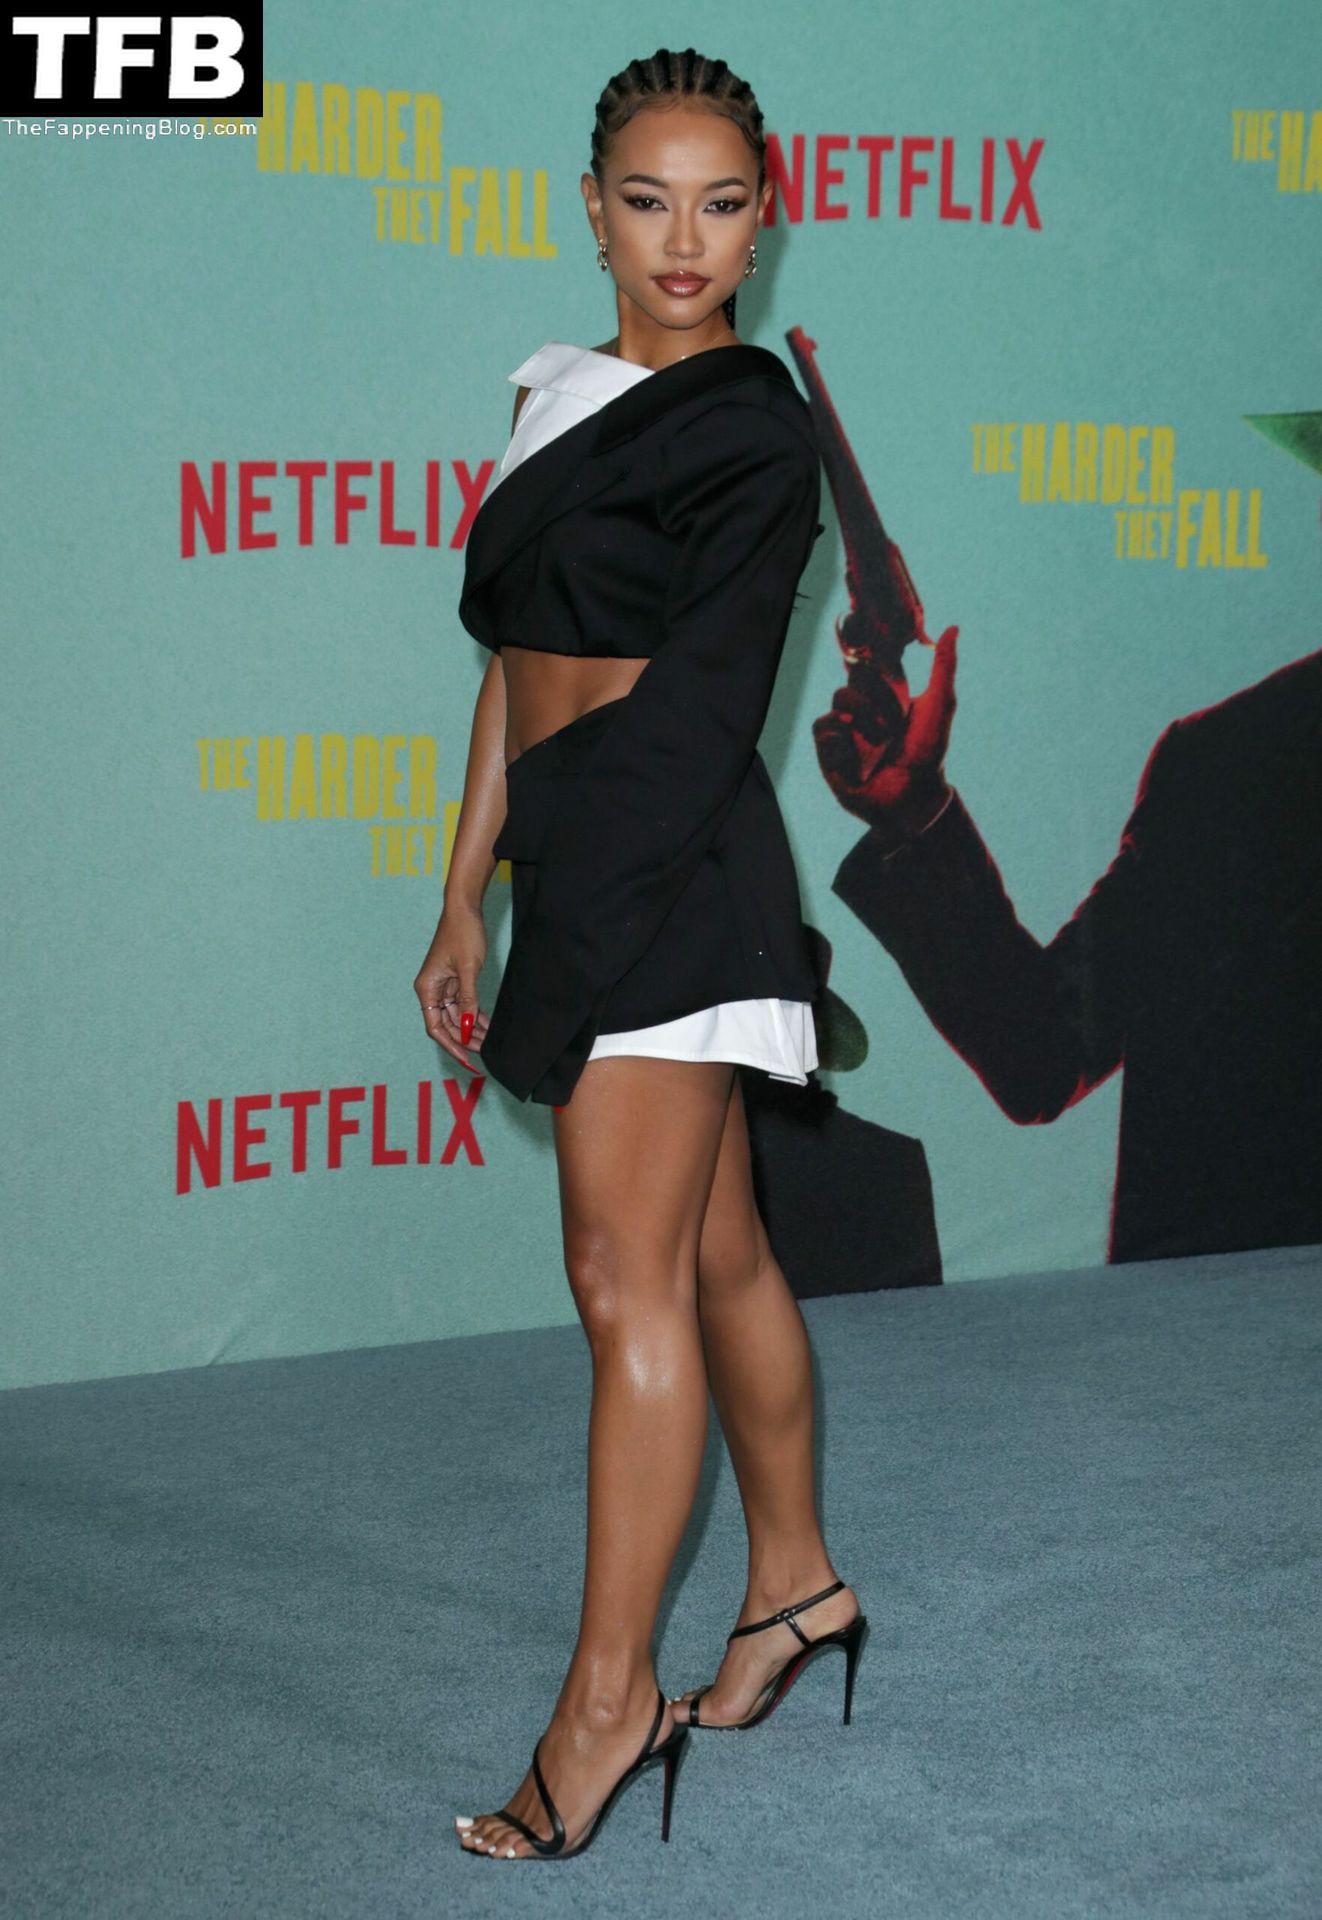 Karrueche-Tran-Sexy-Legs-Upskirt-The-Fappening-Blog-12.jpg